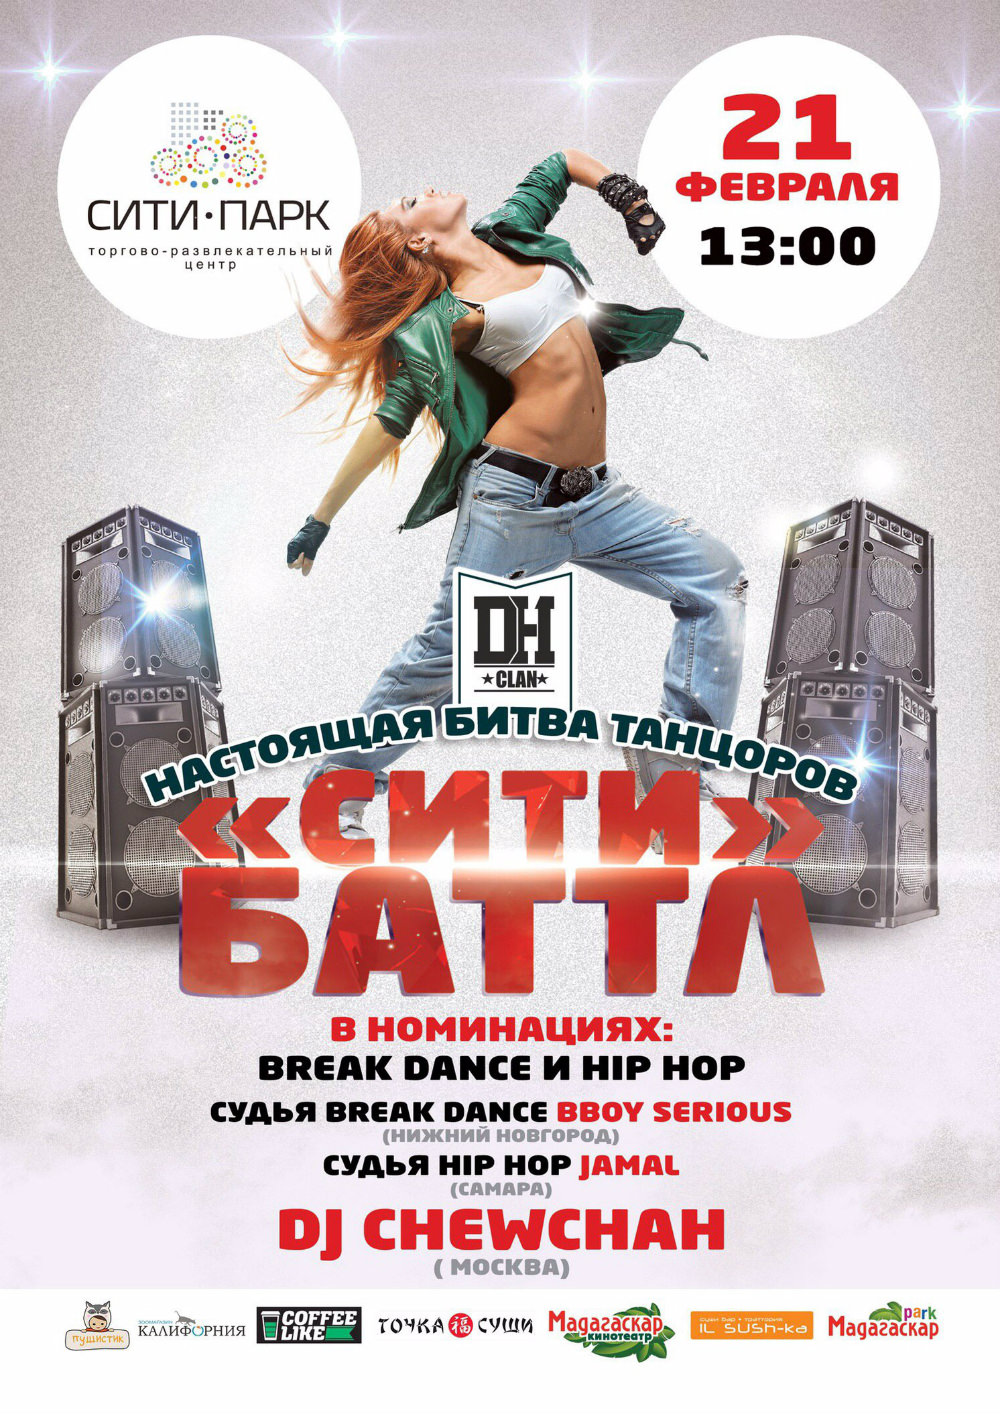 10 занятий   на ближайший уикенд    dance_battle_city_park